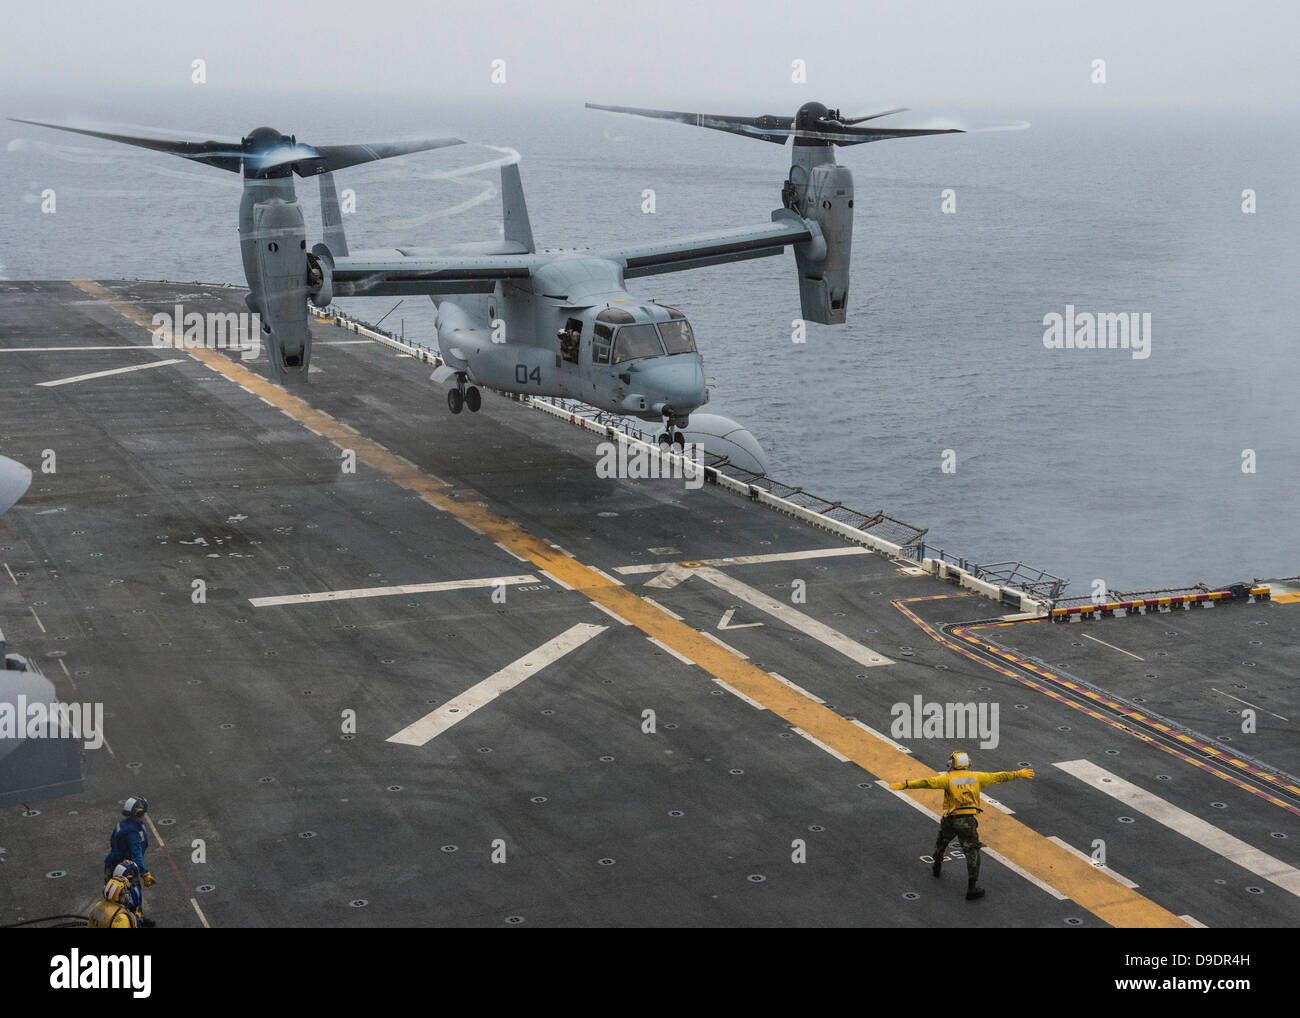 Osp Stock Photos Images Alamy V 22 Osprey Engine Diagram East China Sea June 14 2013 The First Mv To